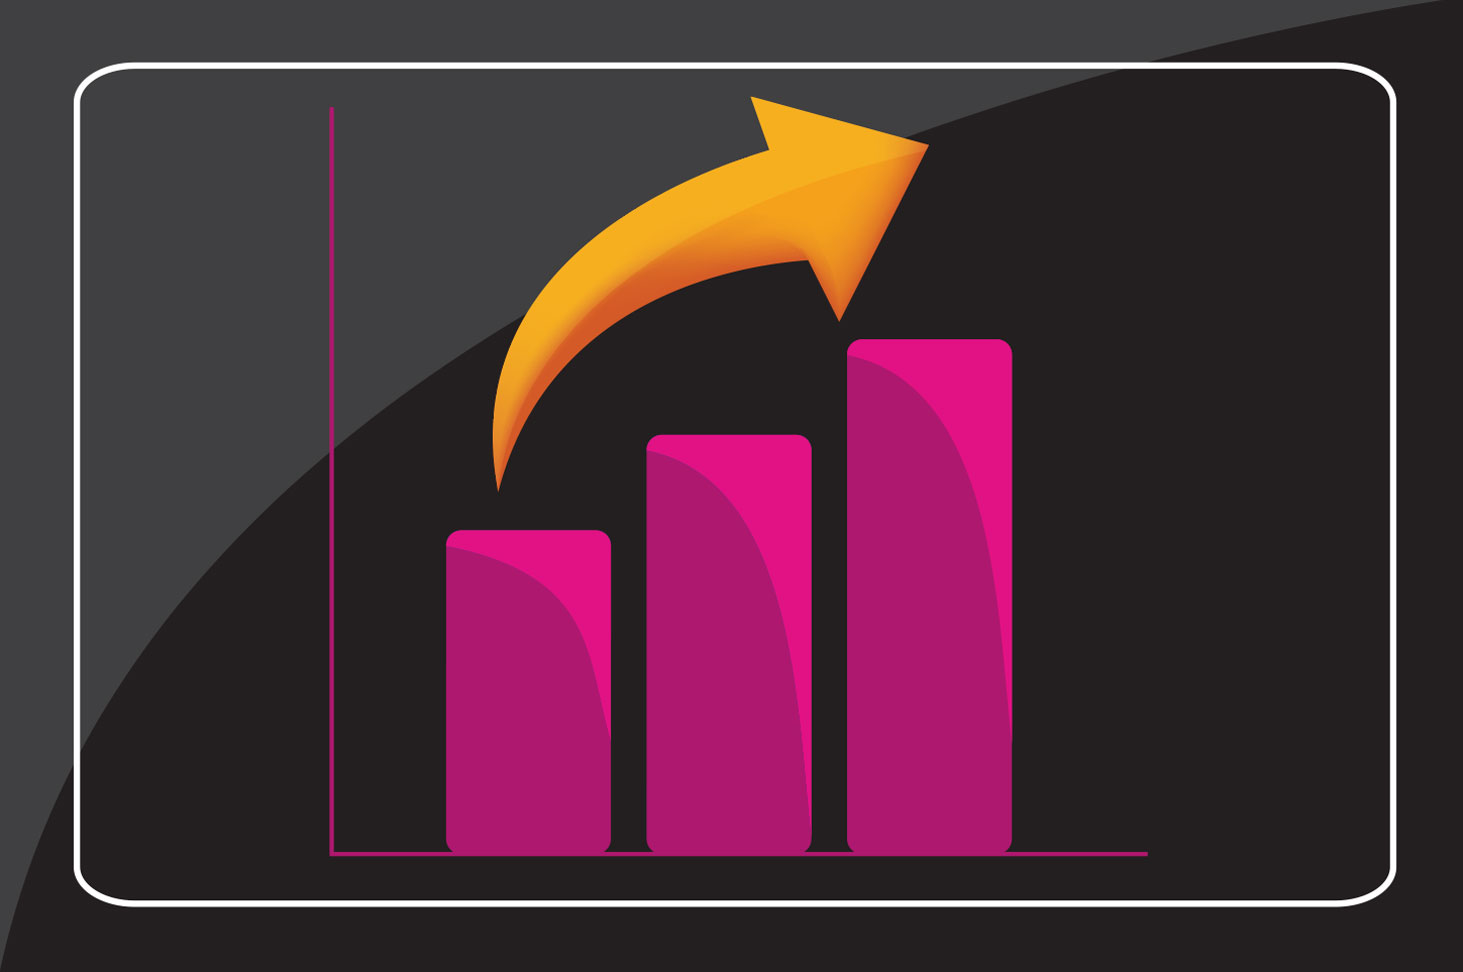 share-price-up-graph.jpg